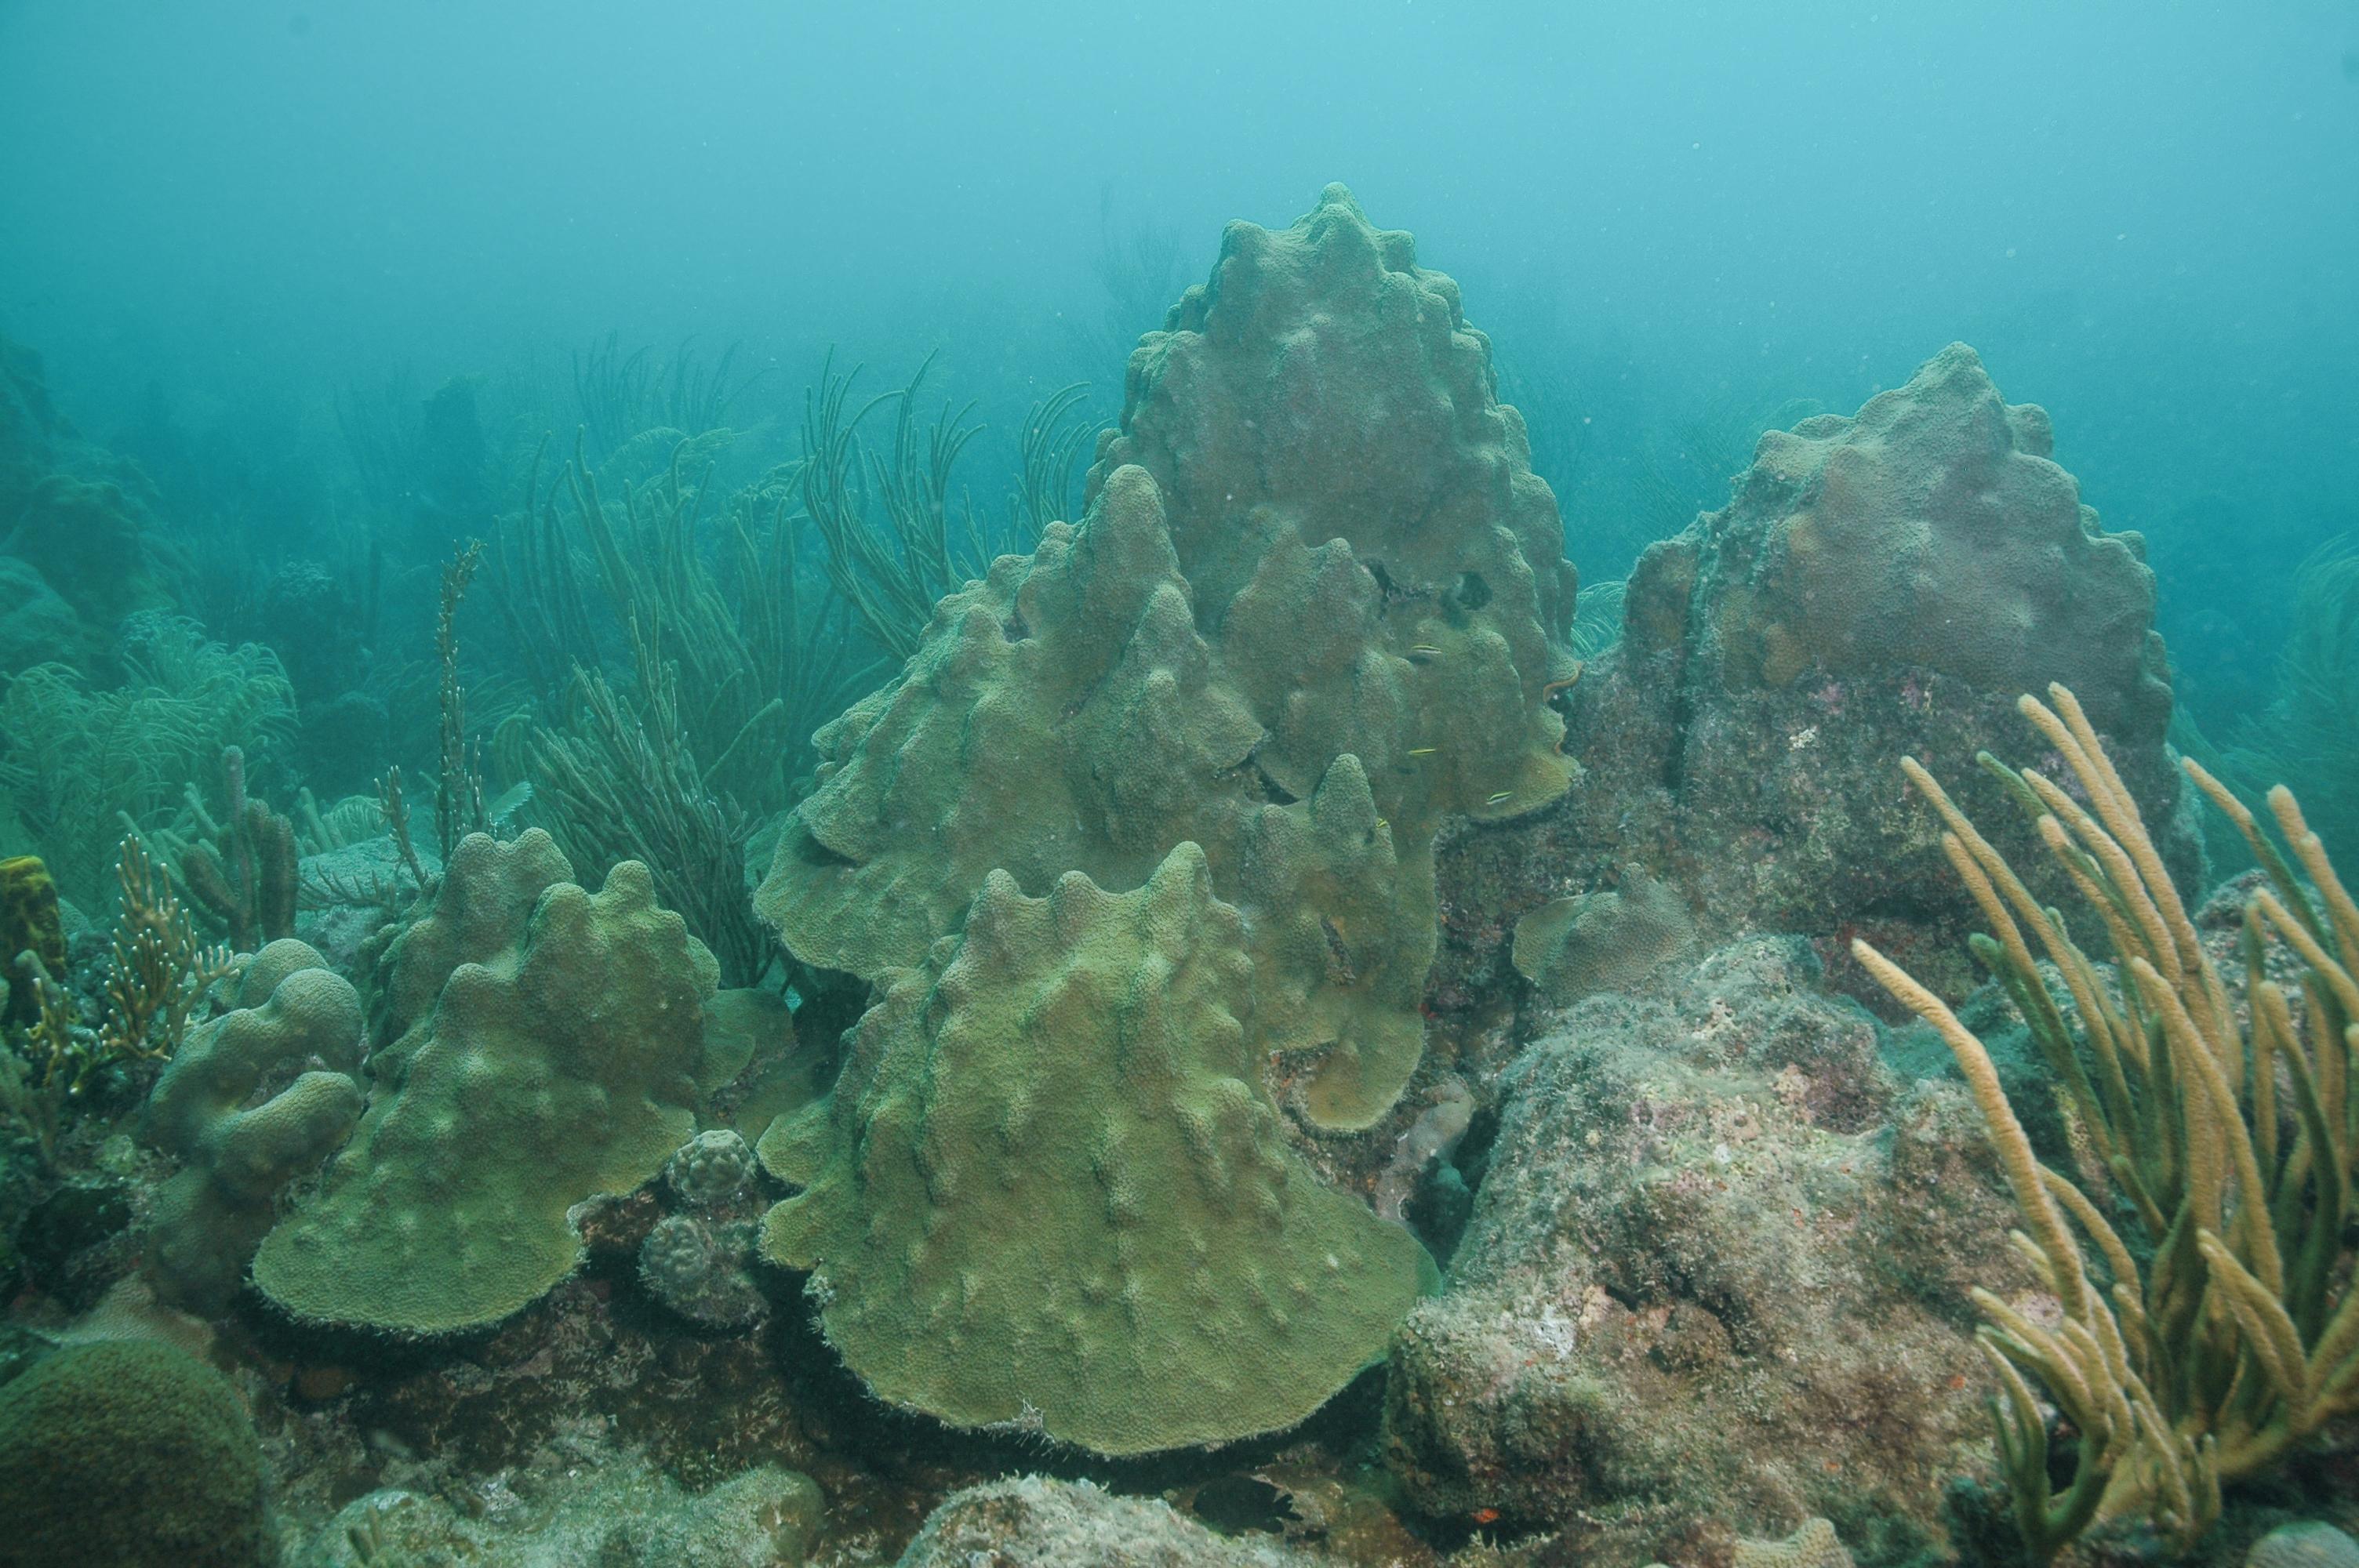 Orbicella faveolata (Coral estrella laminar)